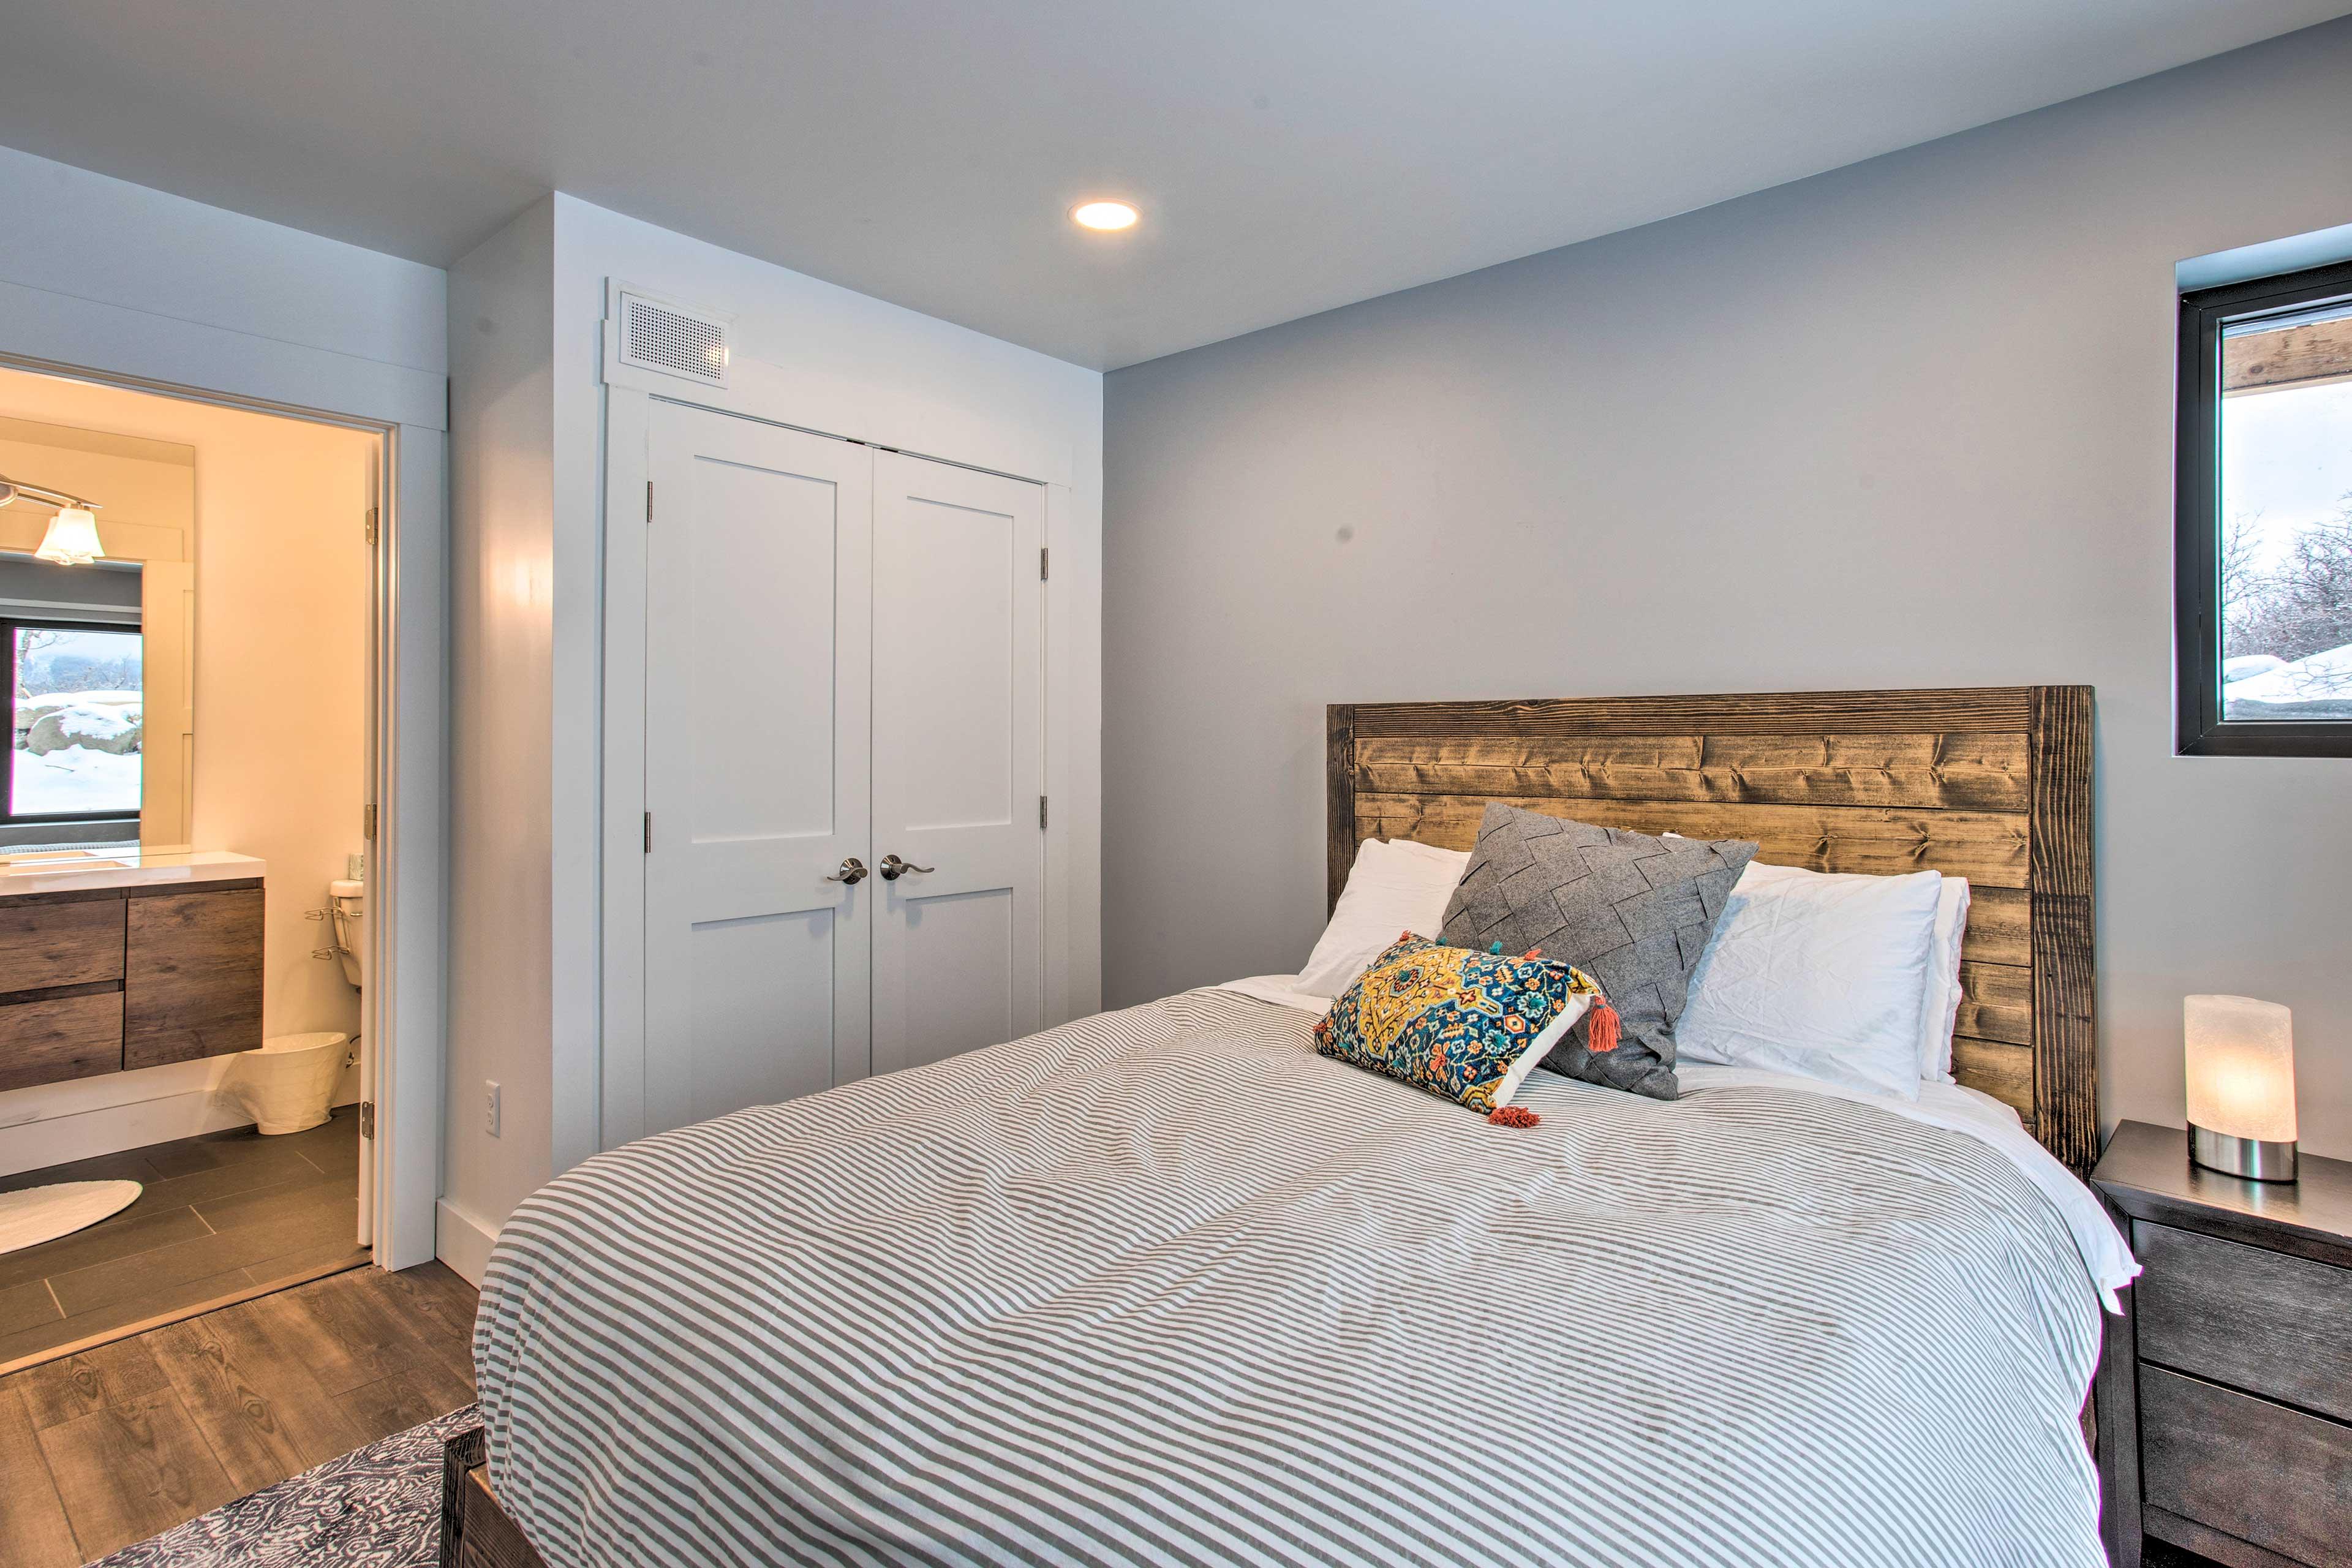 Bedroom 1 | En-Suite Bathroom | Linens Provided